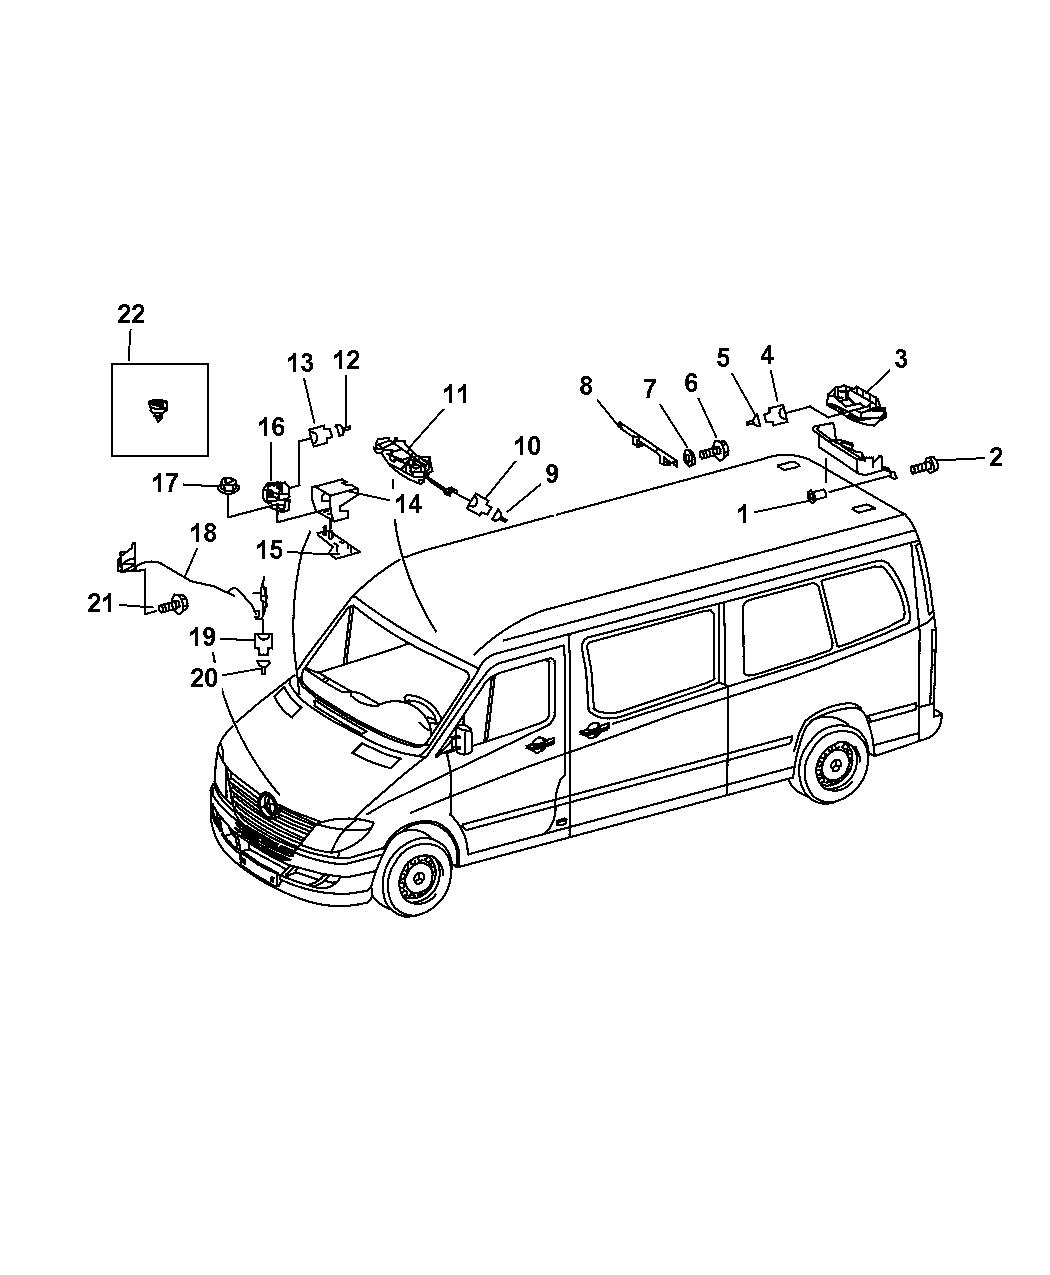 Dodge Sprinter Siren Alarm System